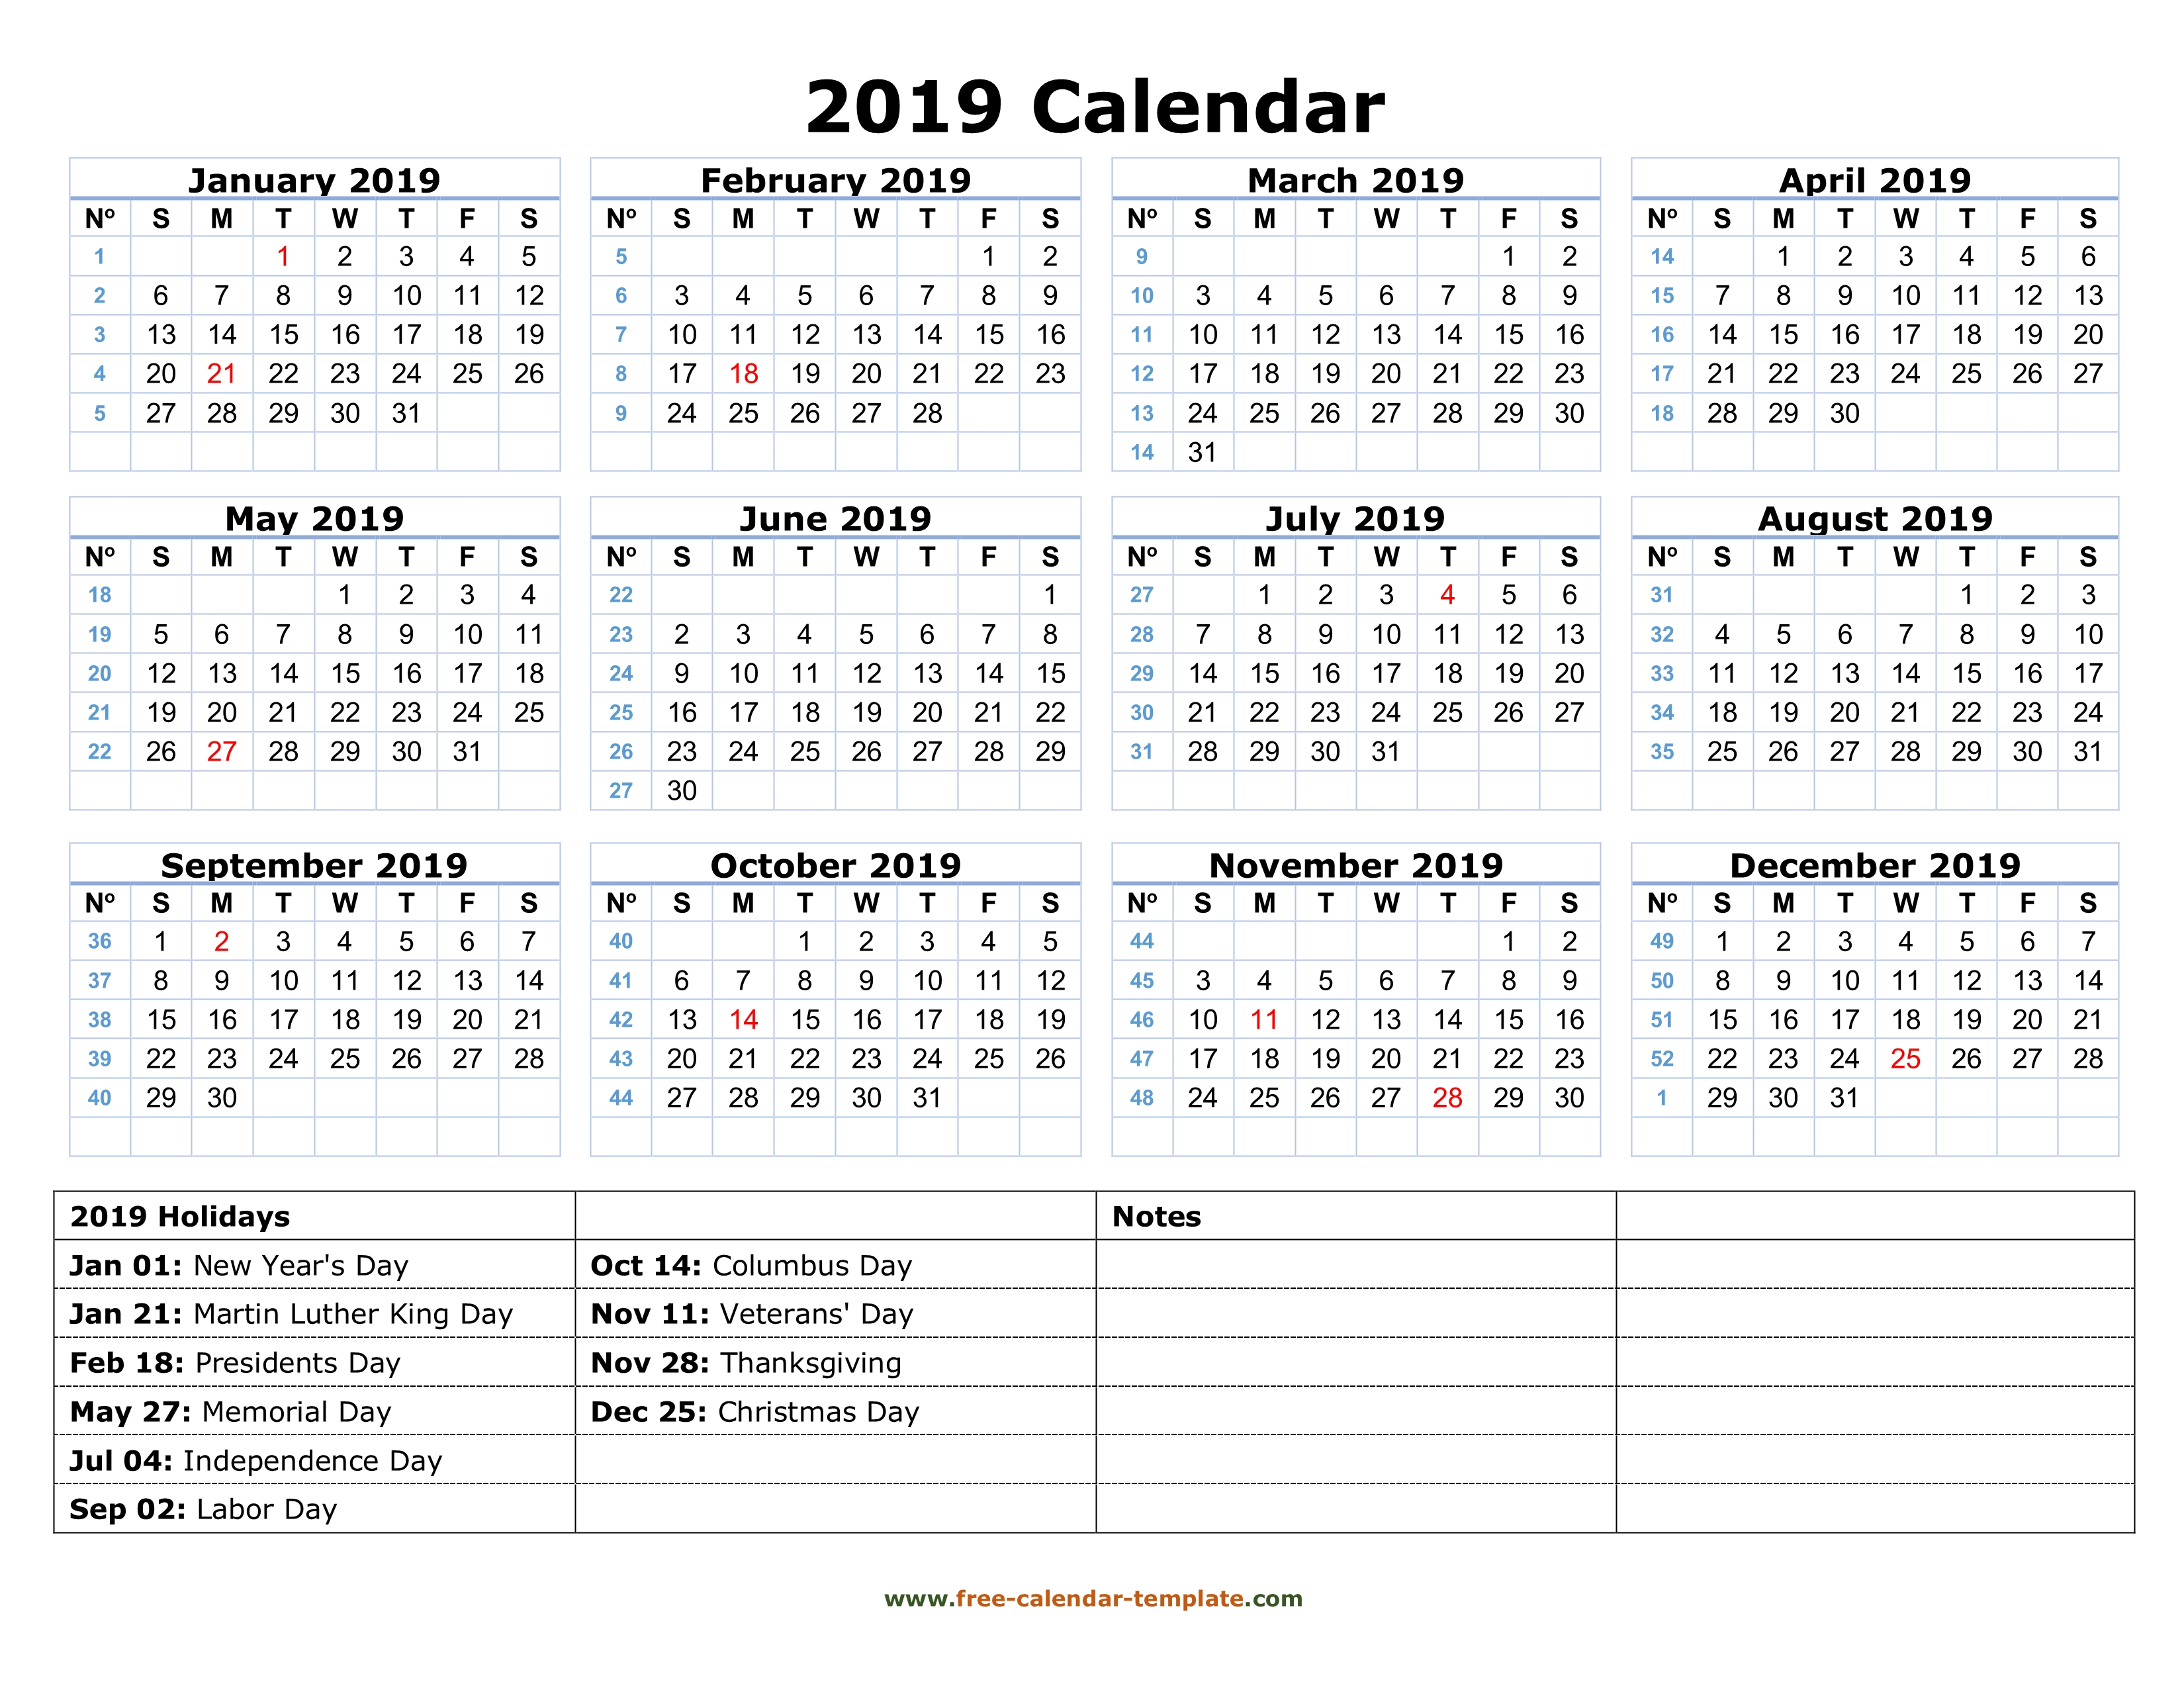 Printable Yearly Calendar 2019 | Free-Calendar-Template regarding Calendar With Holidays Printable Templates